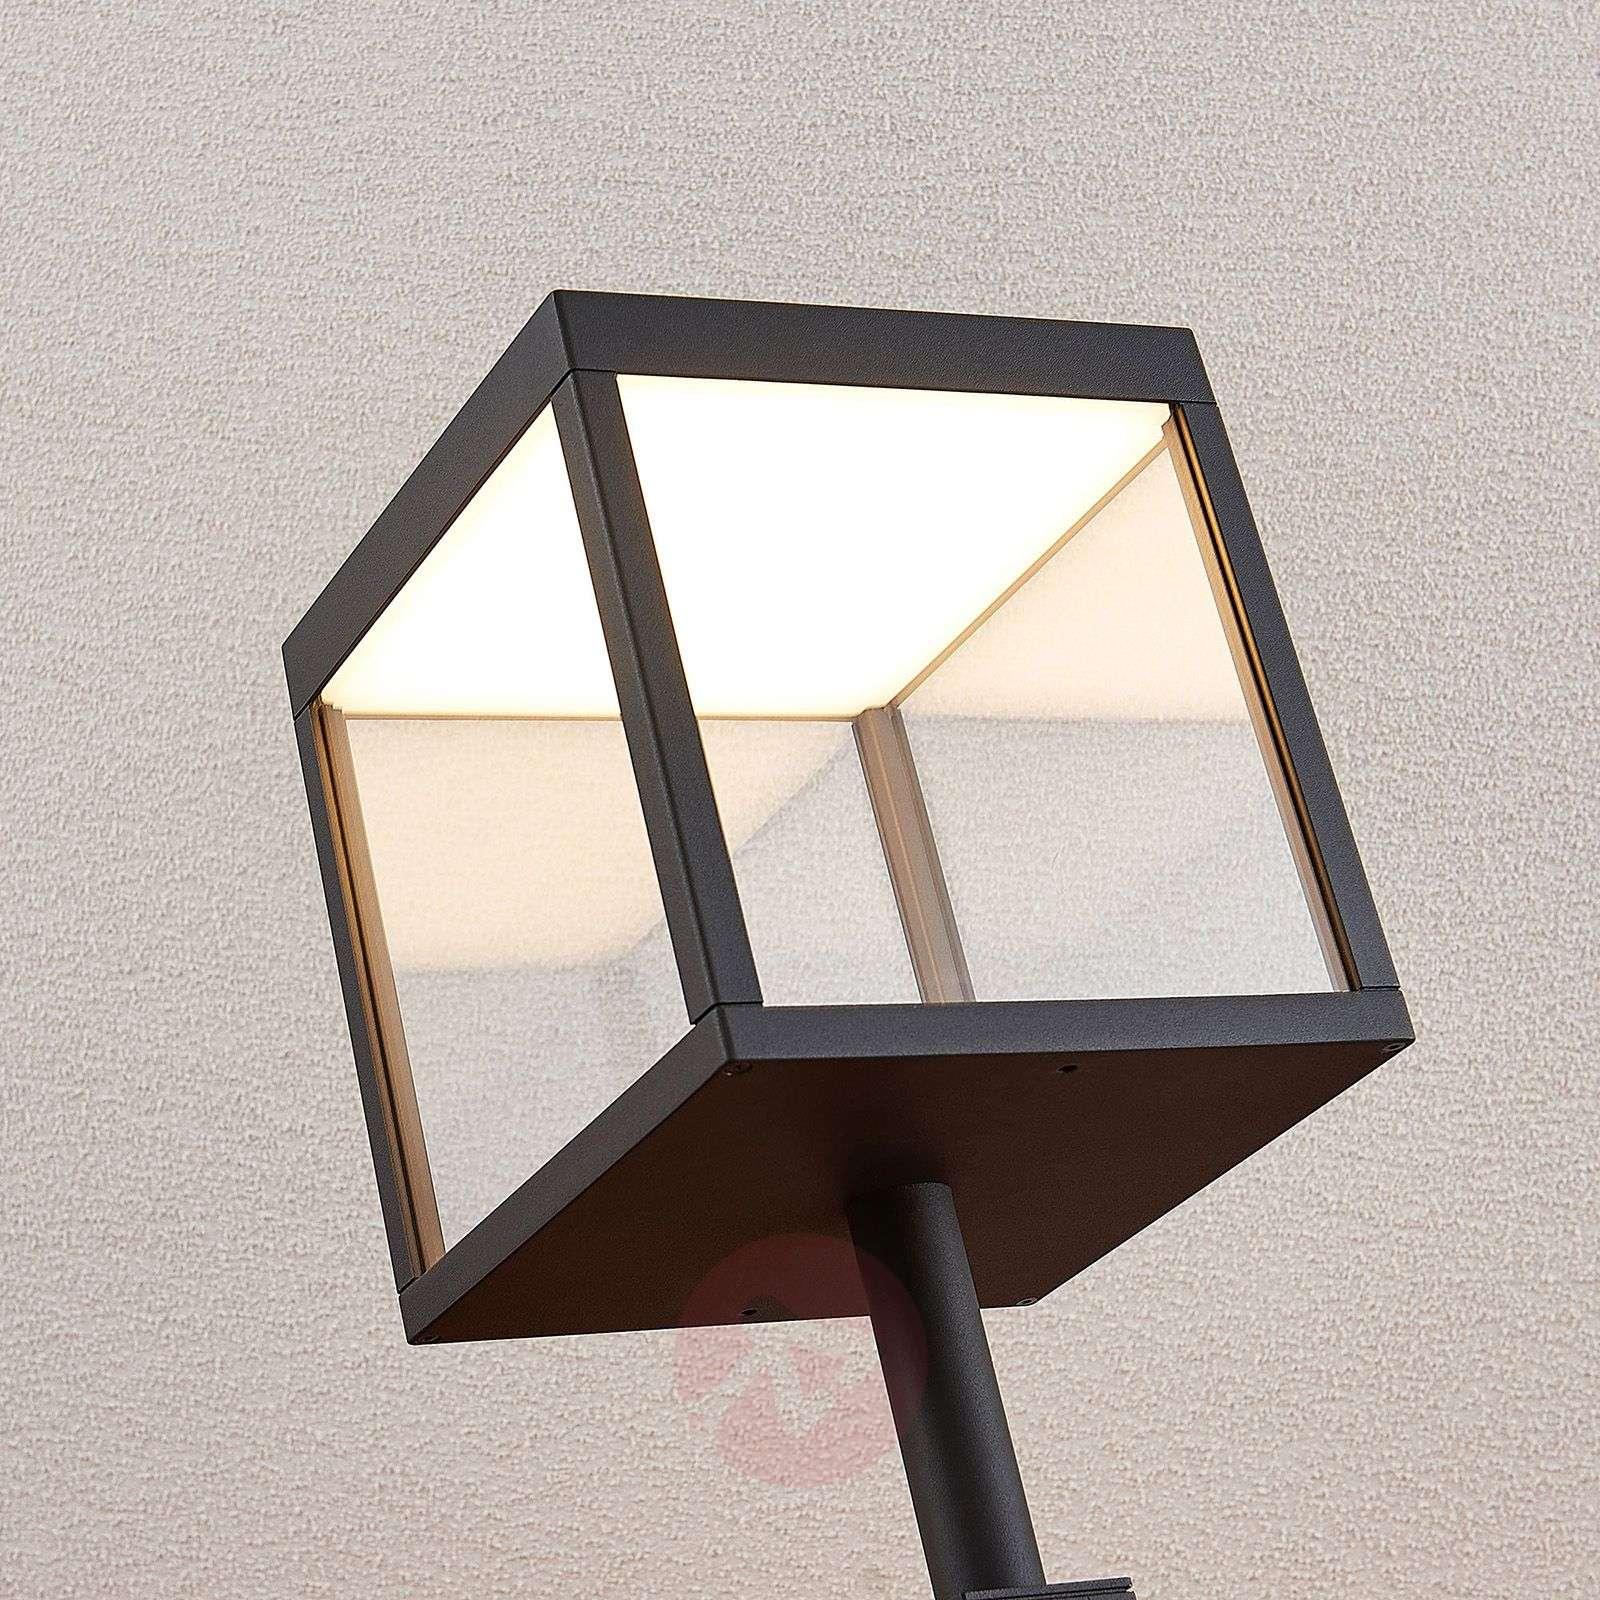 LED-pylväsvalaisin Cube, grafiitinharmaa, IP54-9619163-03